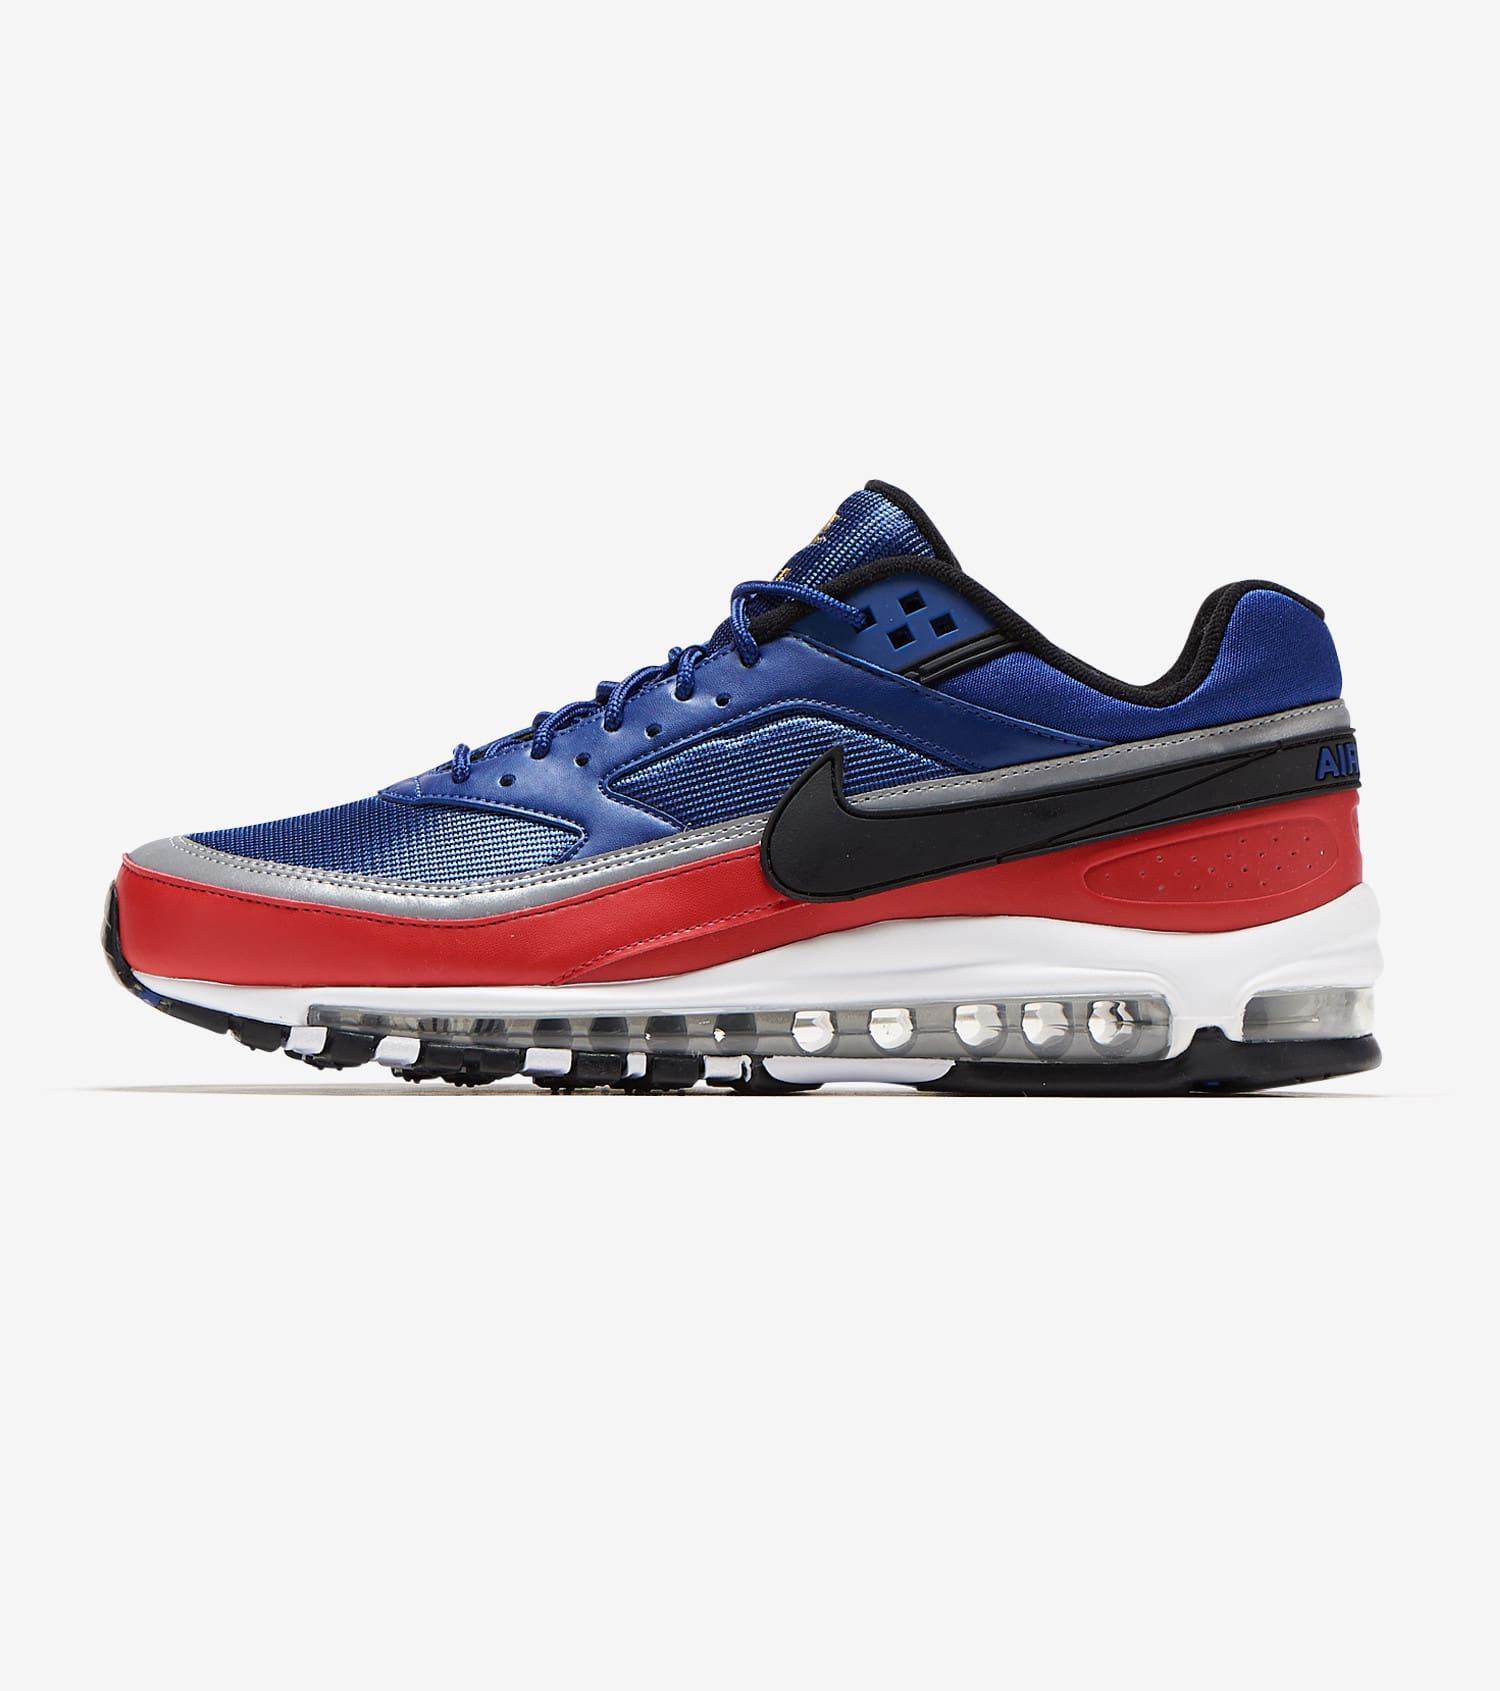 Nike Air Max 97 BW Deep Blue Red Size 7 8 9 10 11 12 Mens